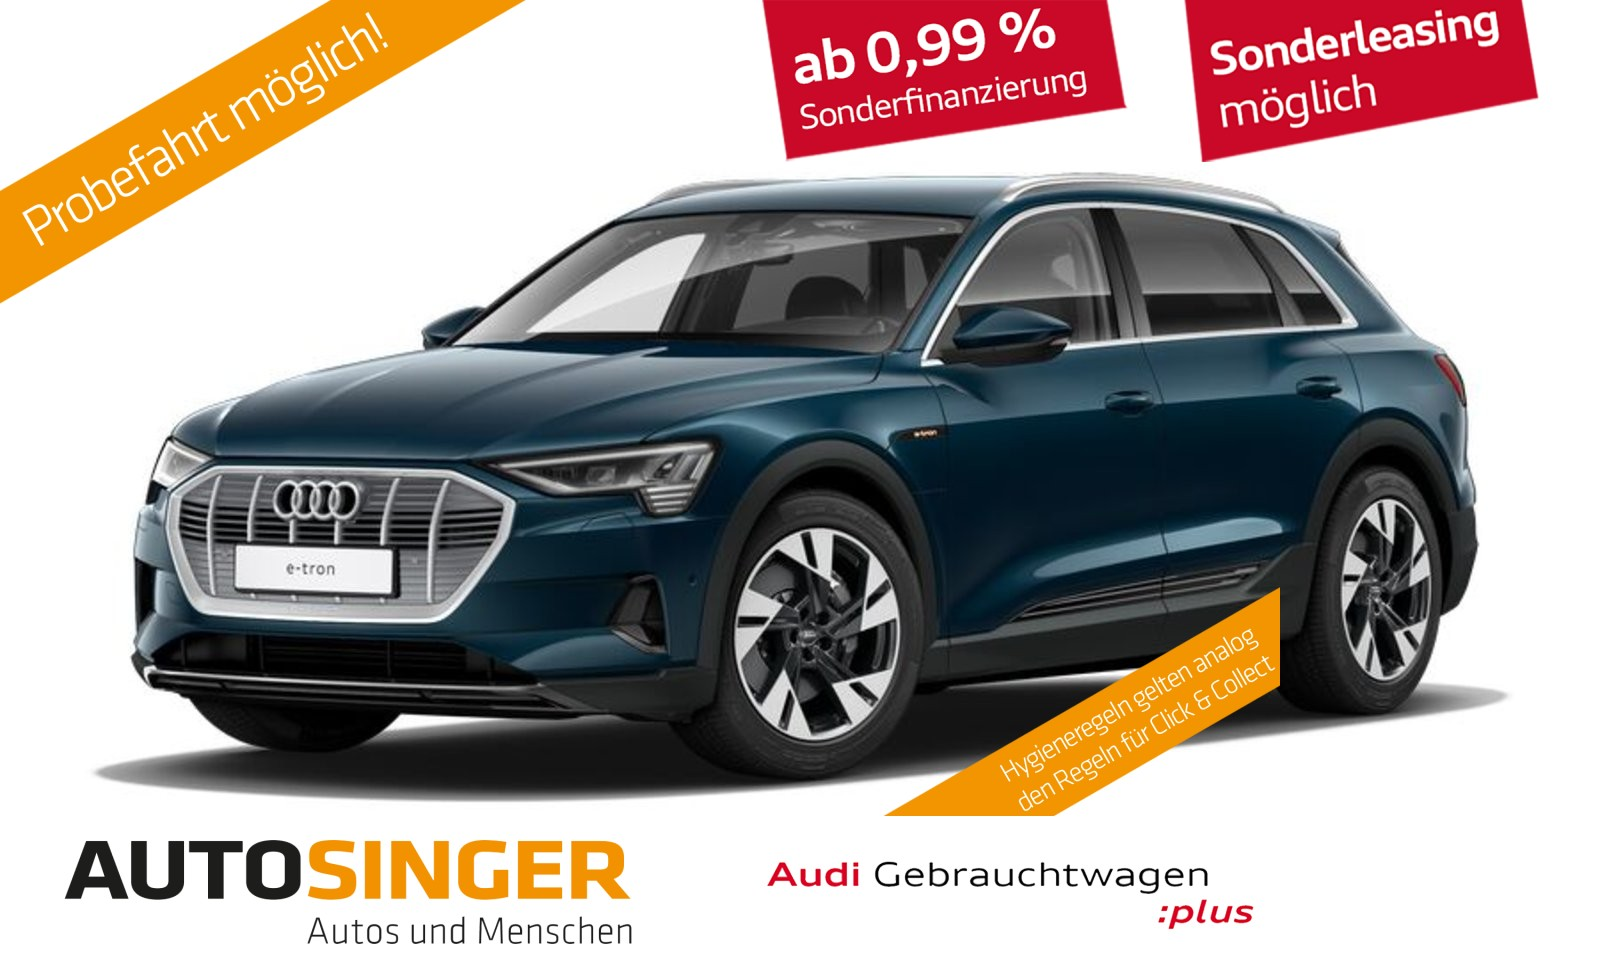 Audi e-tron 50 BAFA*5000möglich*Virtual*Luftf*Navi*LED*, Jahr 2020, Elektro